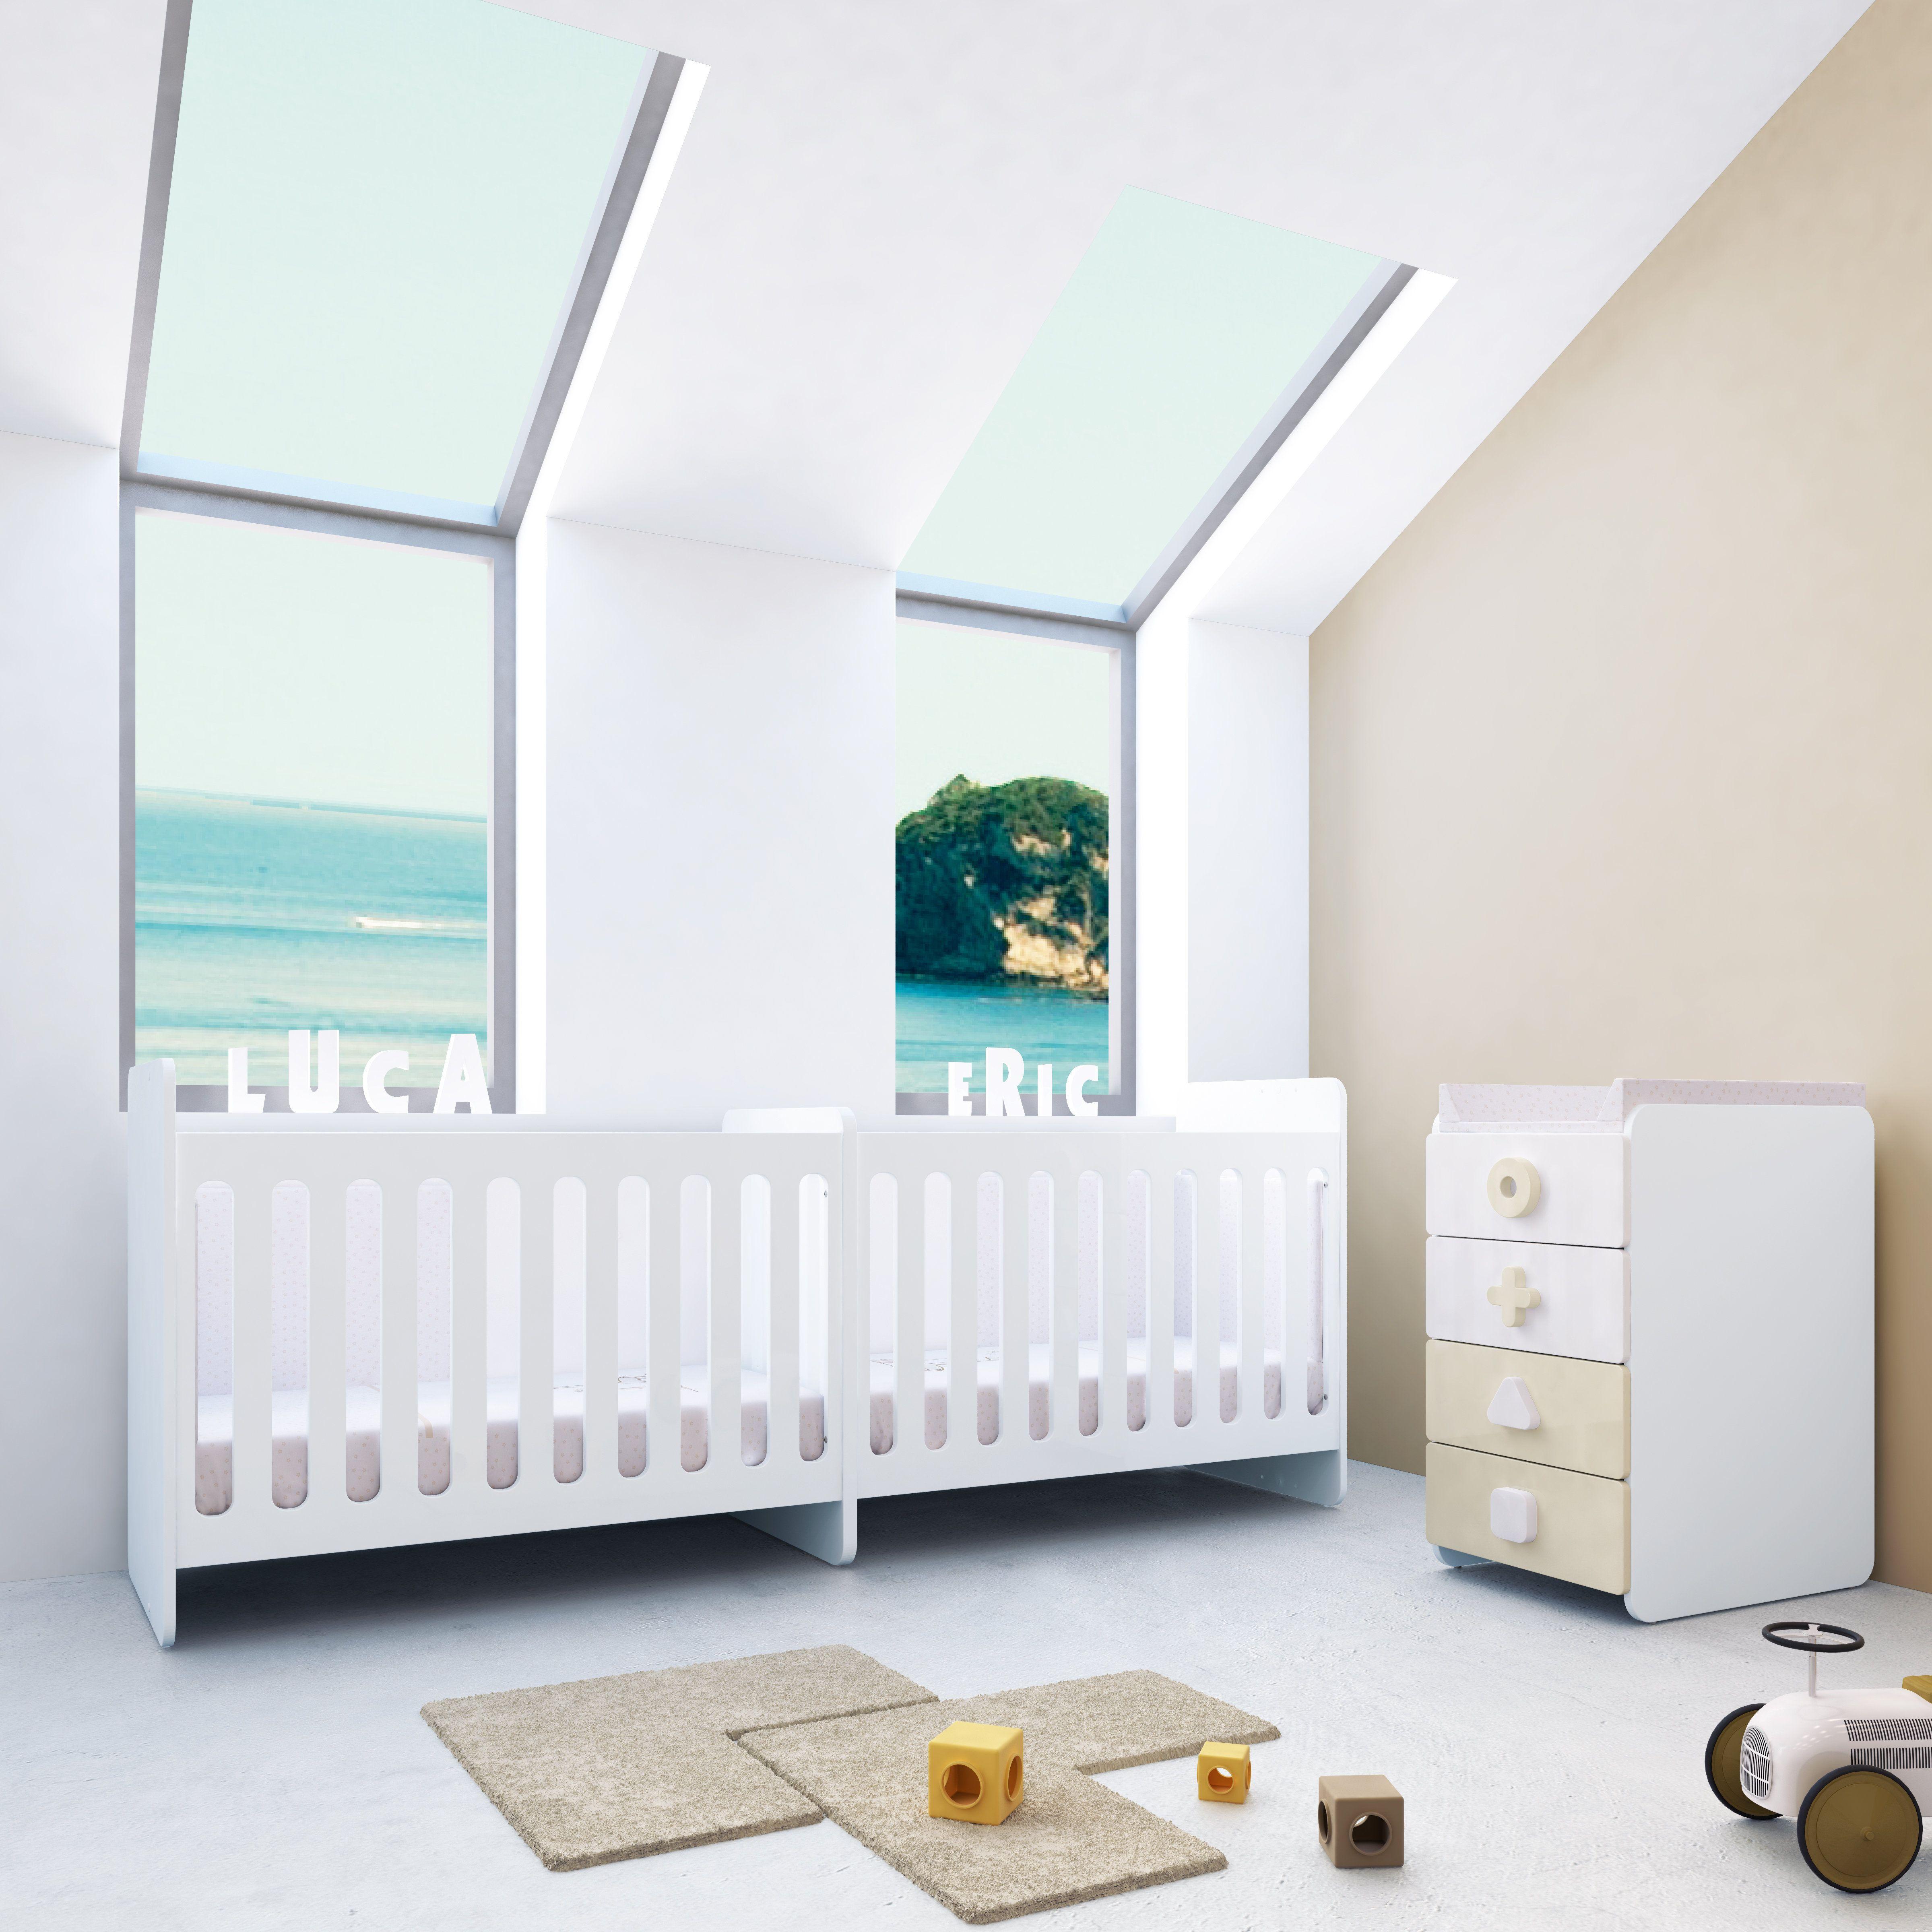 Habitaci n infantil twins due maths de alondra la - Diseno habitacion infantil ...